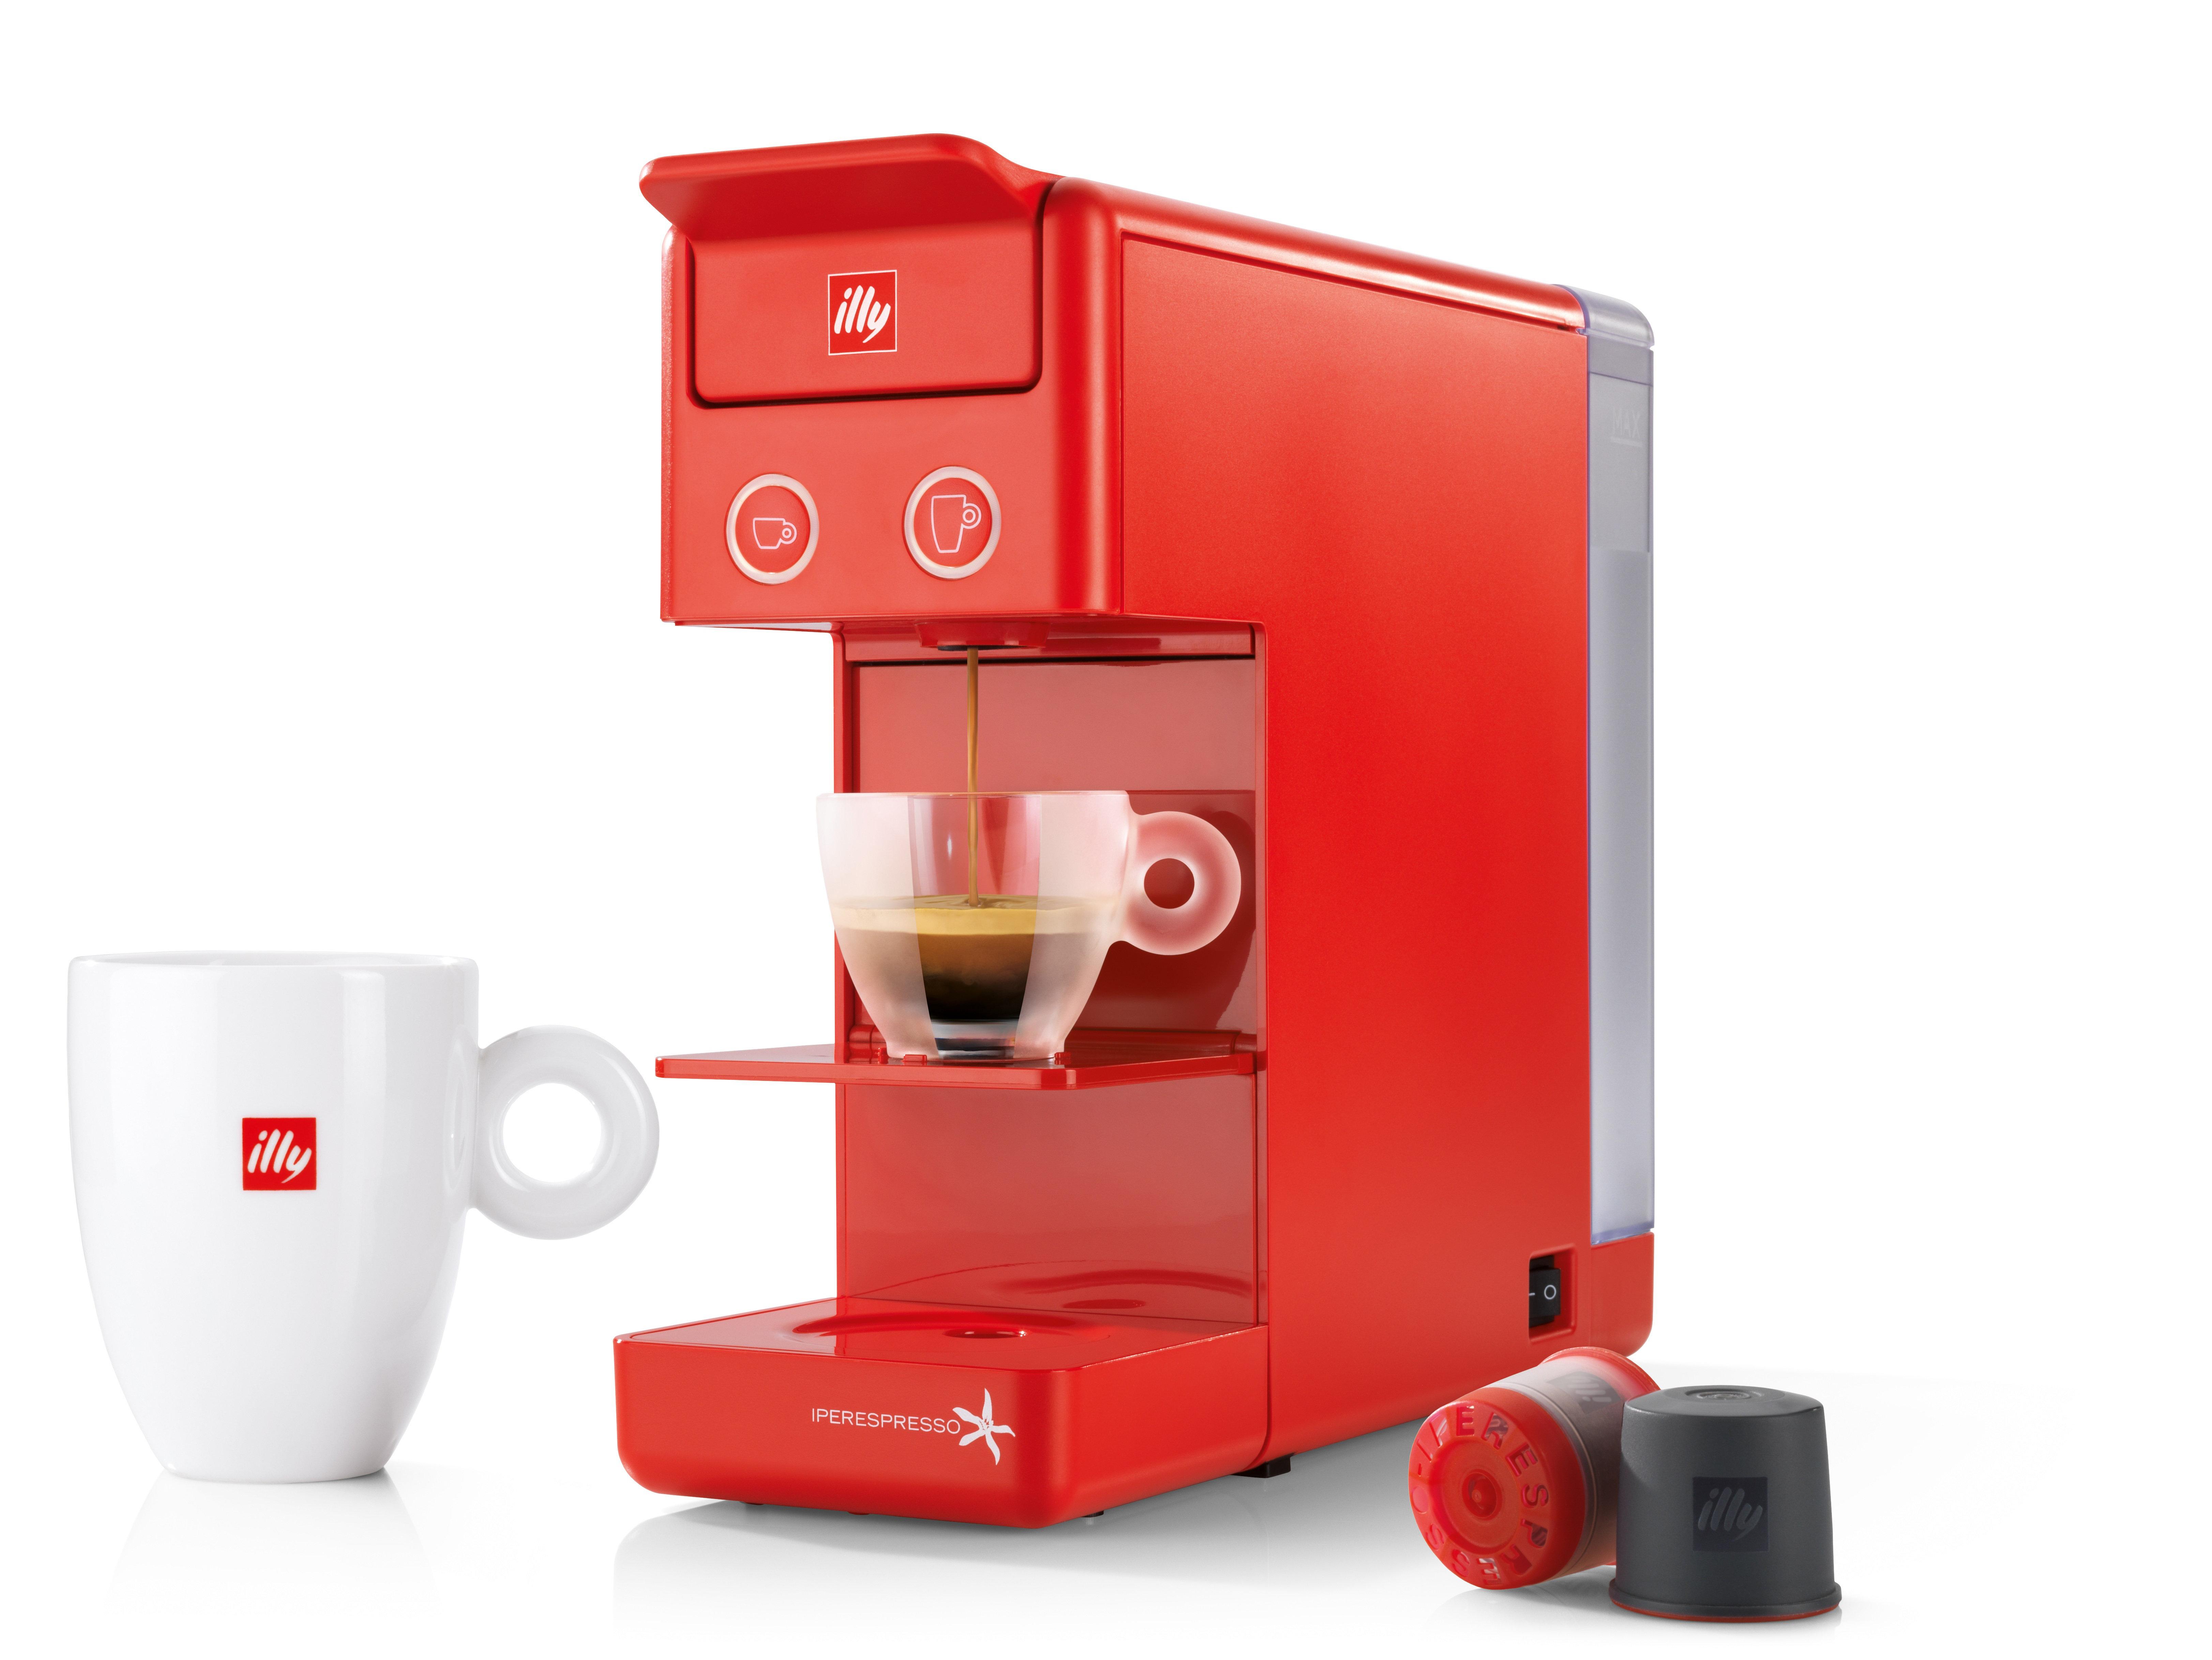 Illy Caffe & Espresso Y3.2 Coffee & Espresso Maker   Wayfair